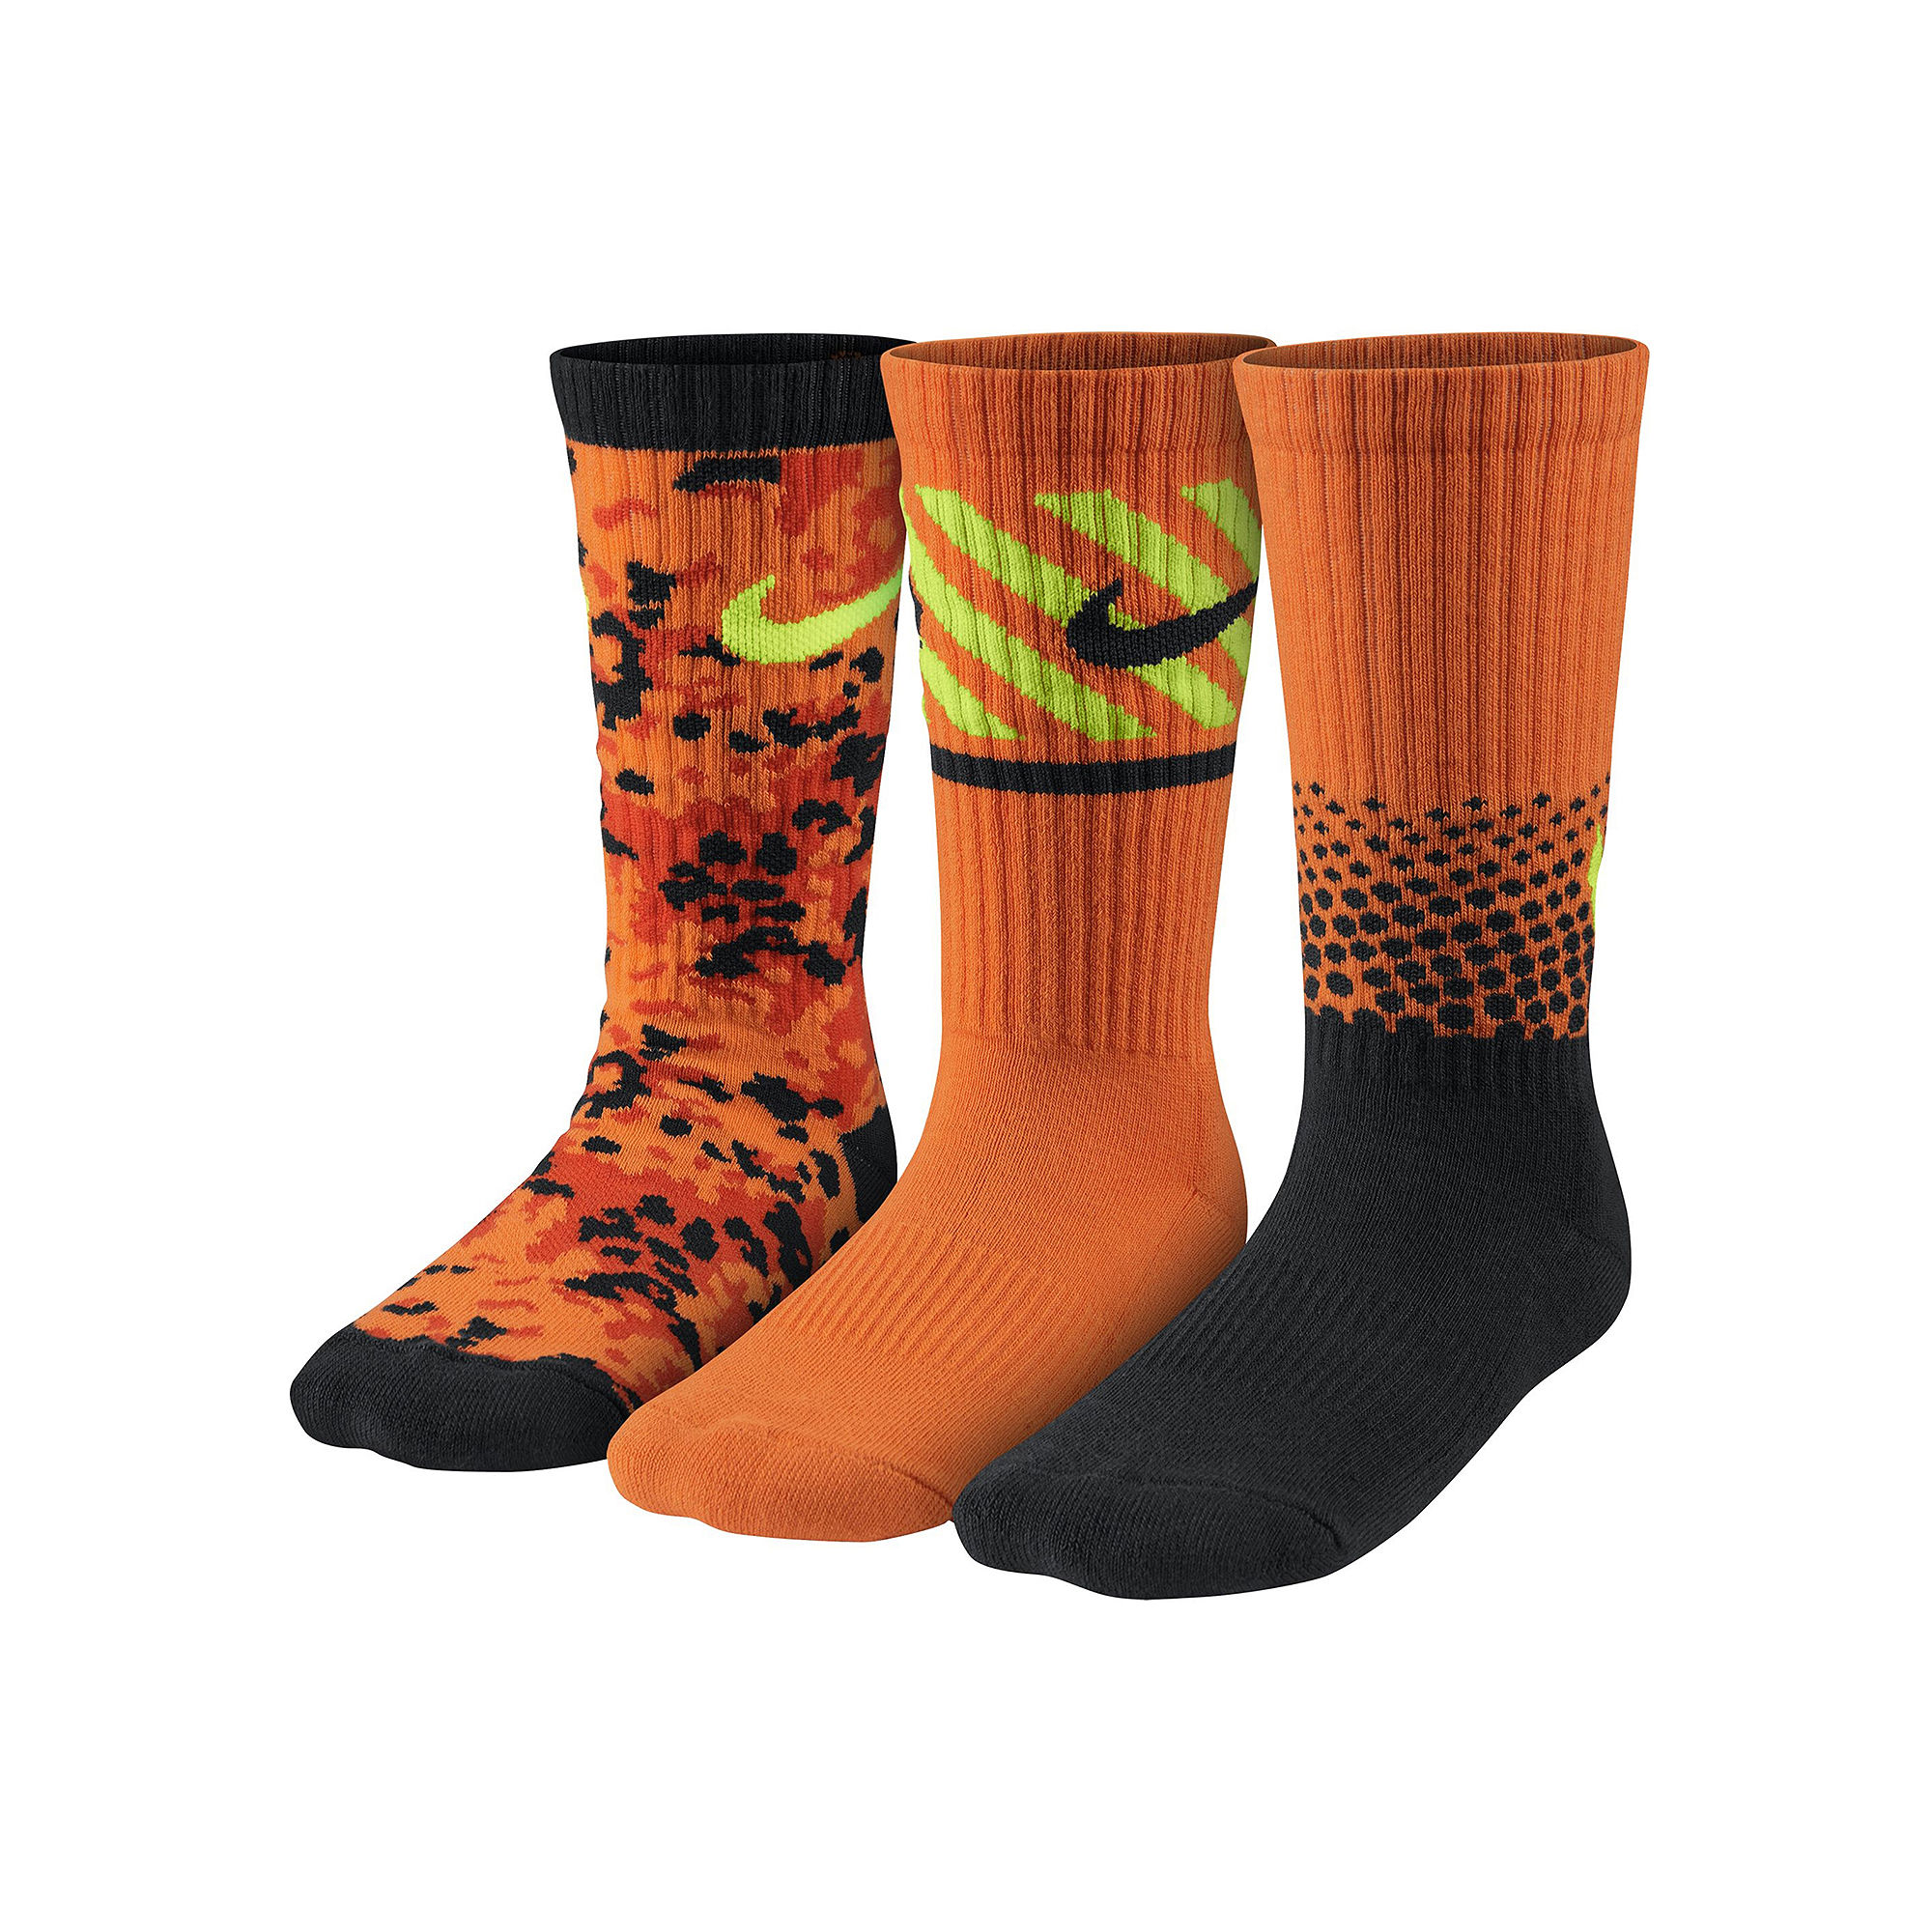 514caa4a0 UPC 888409185371 product image for Nike 3-pk. Graphic Crew Socks - Boys ...